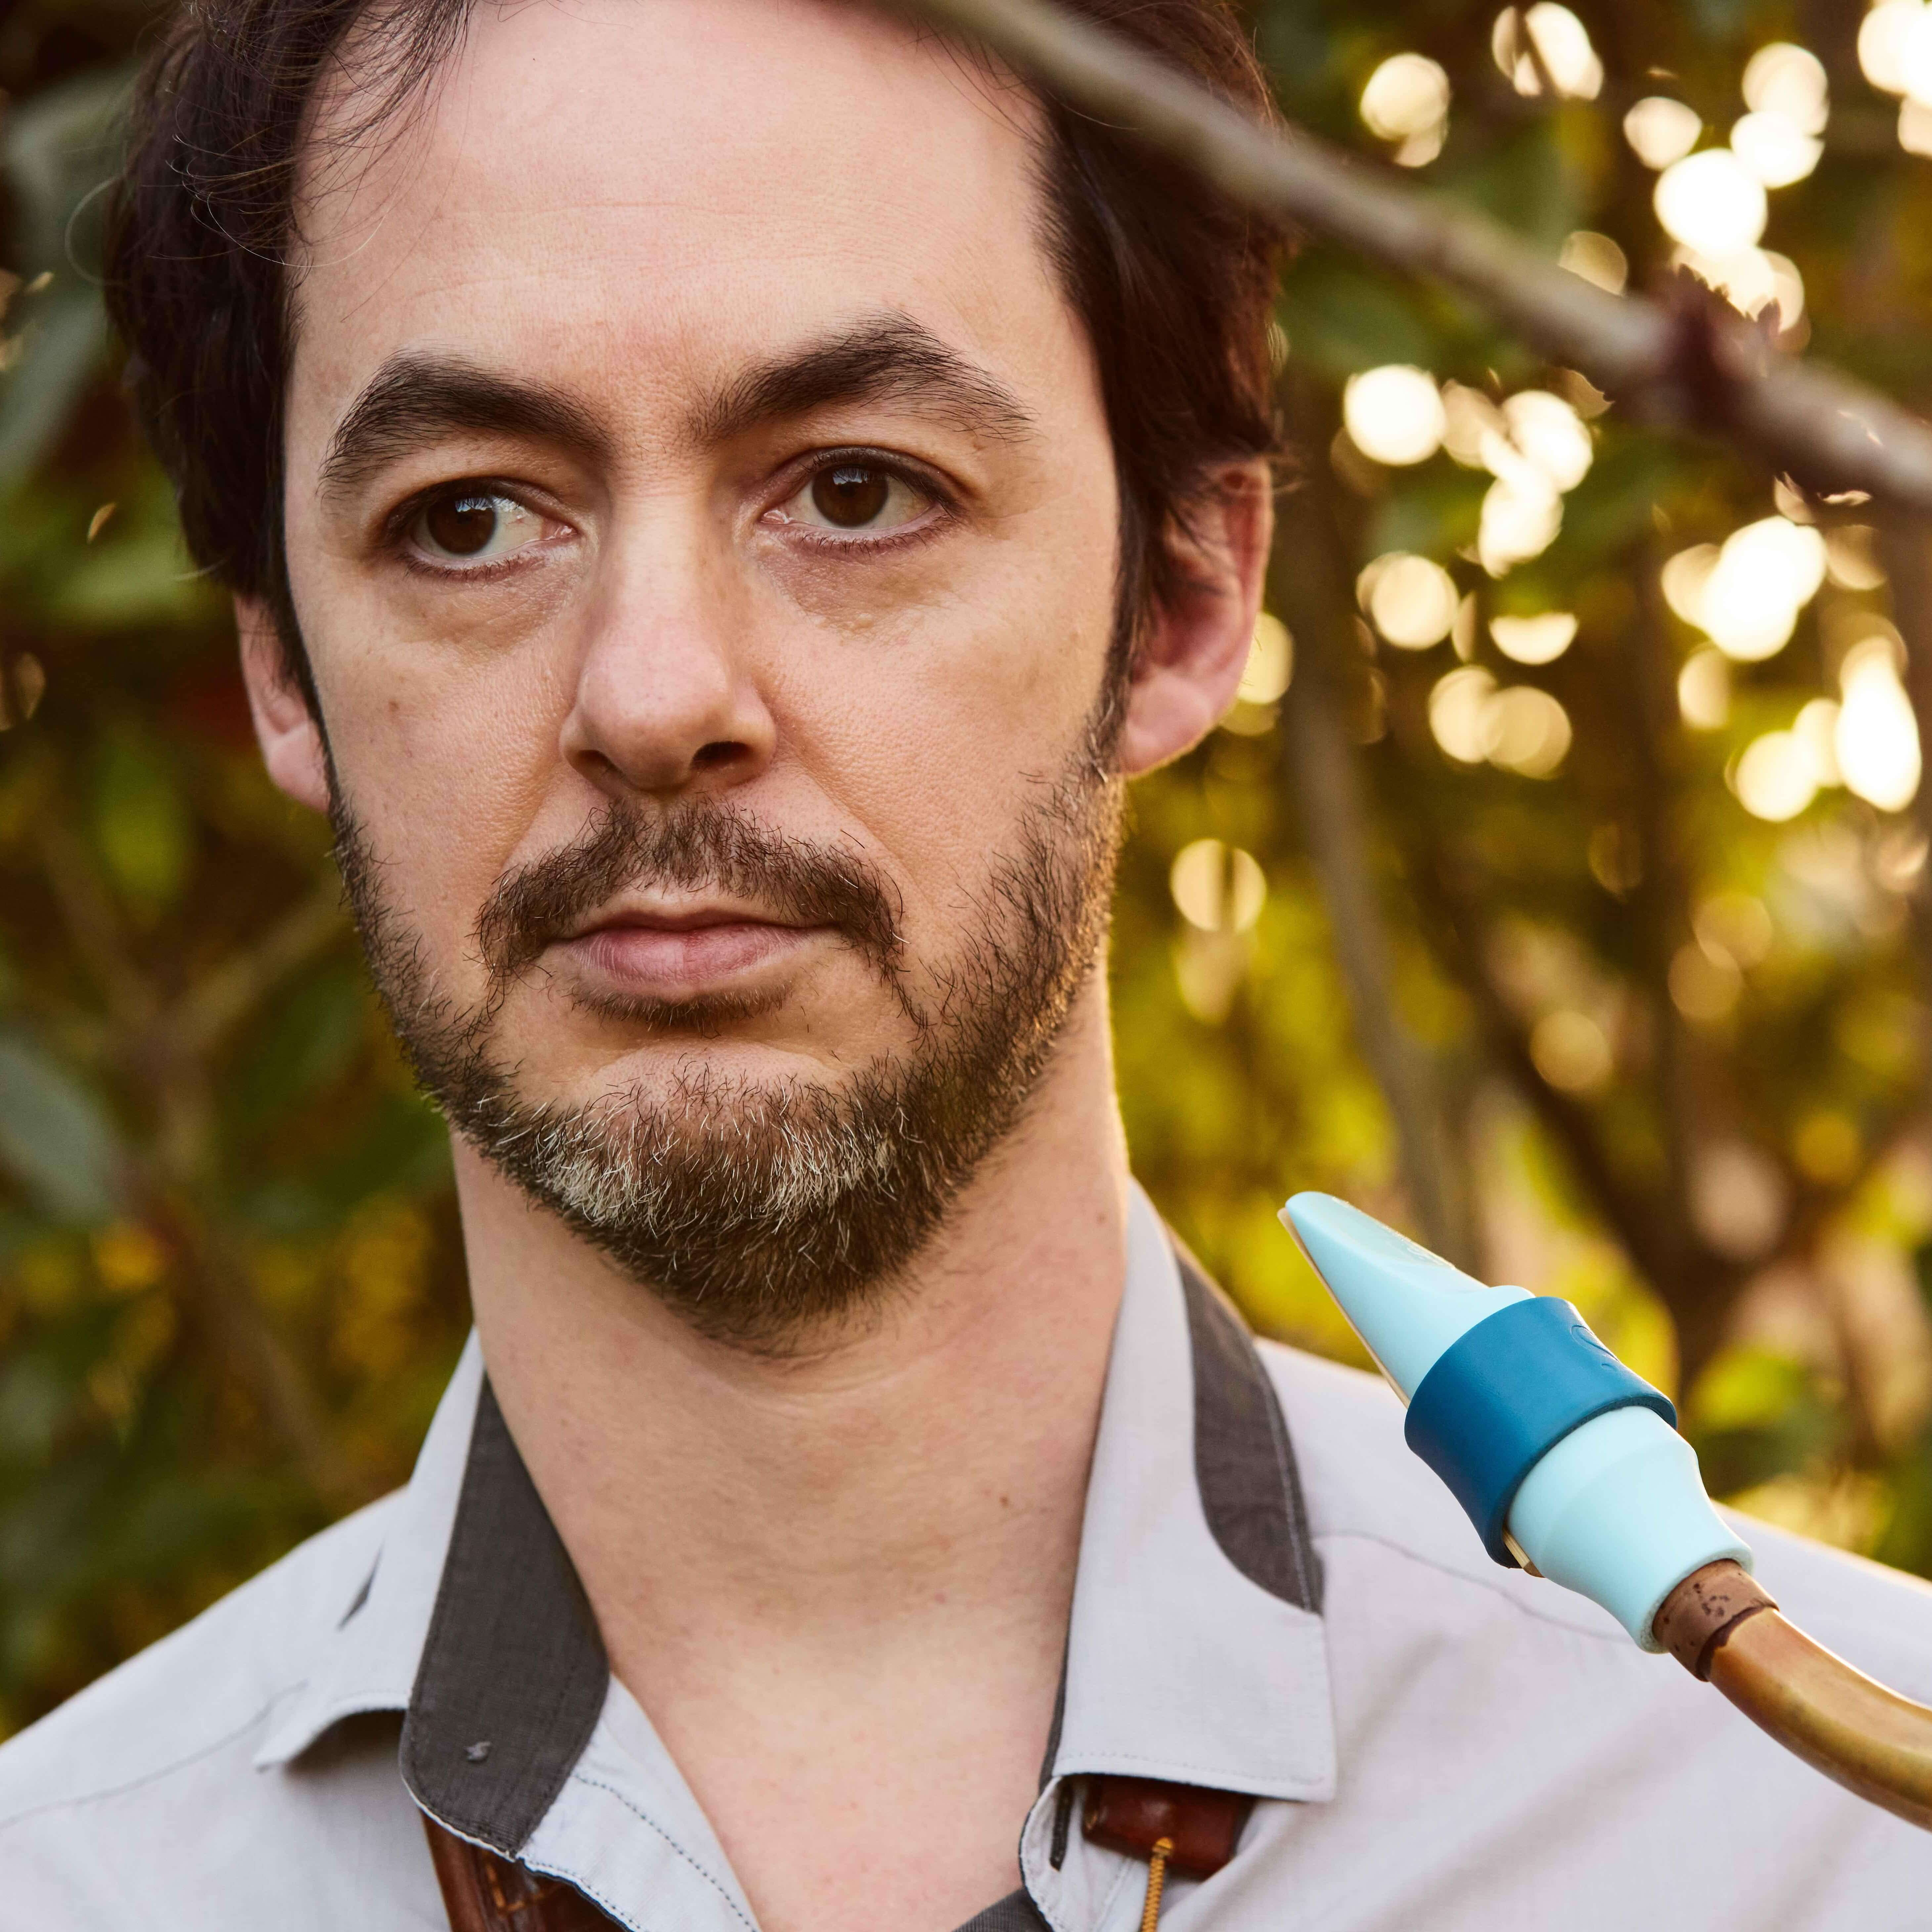 Jean-François Petitjean plays a Syos saxophone mouthpiece